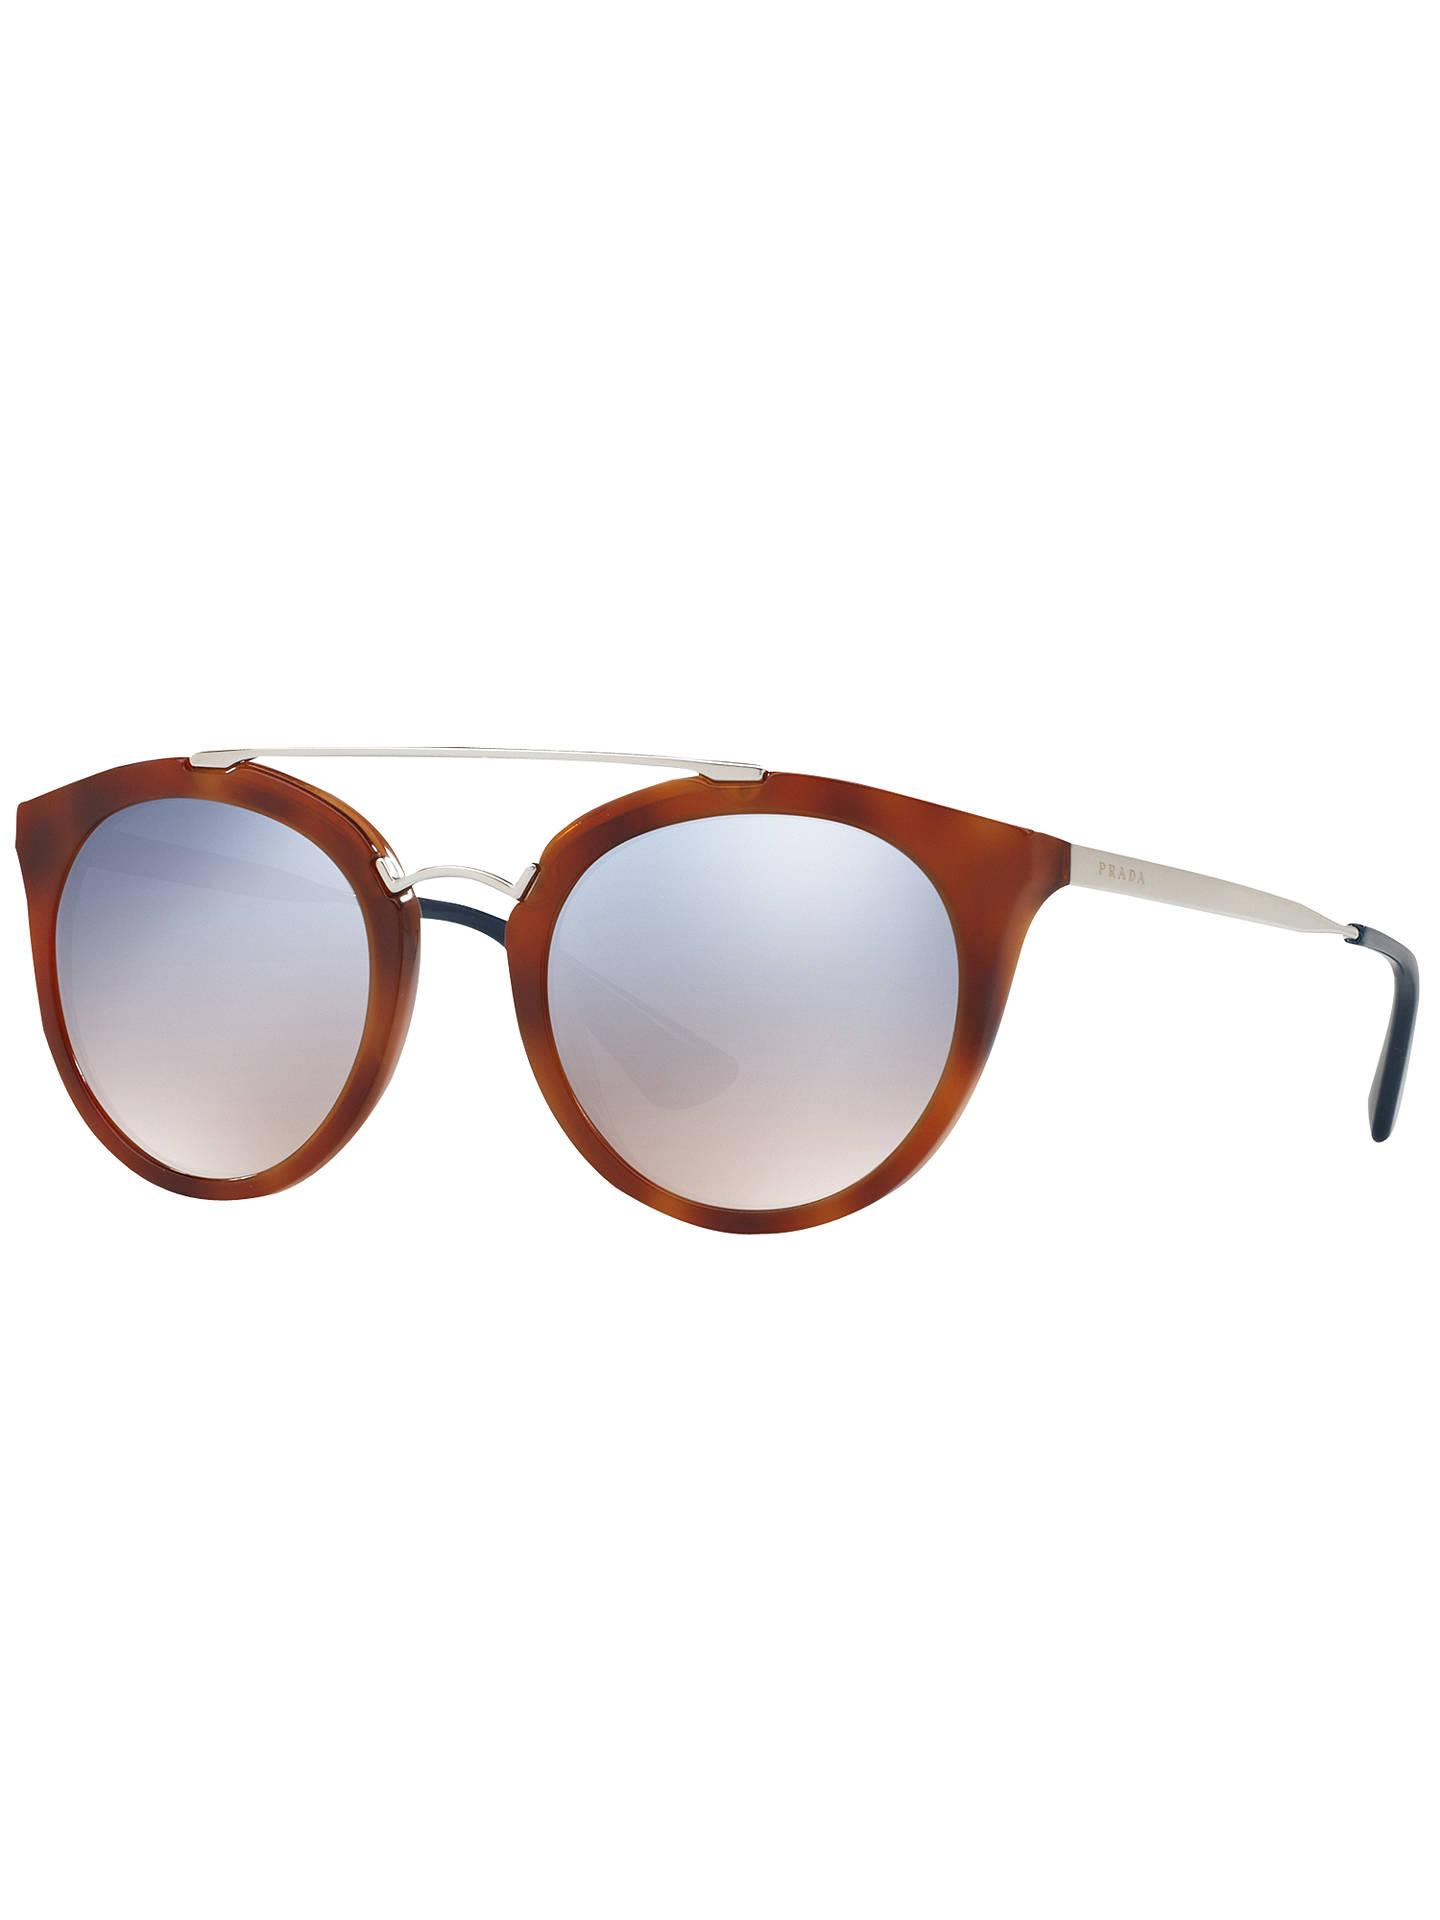 3d224c43f20a Buy Prada PR 23SS Cinema Oval Sunglasses, Brown Online at johnlewis.com ...